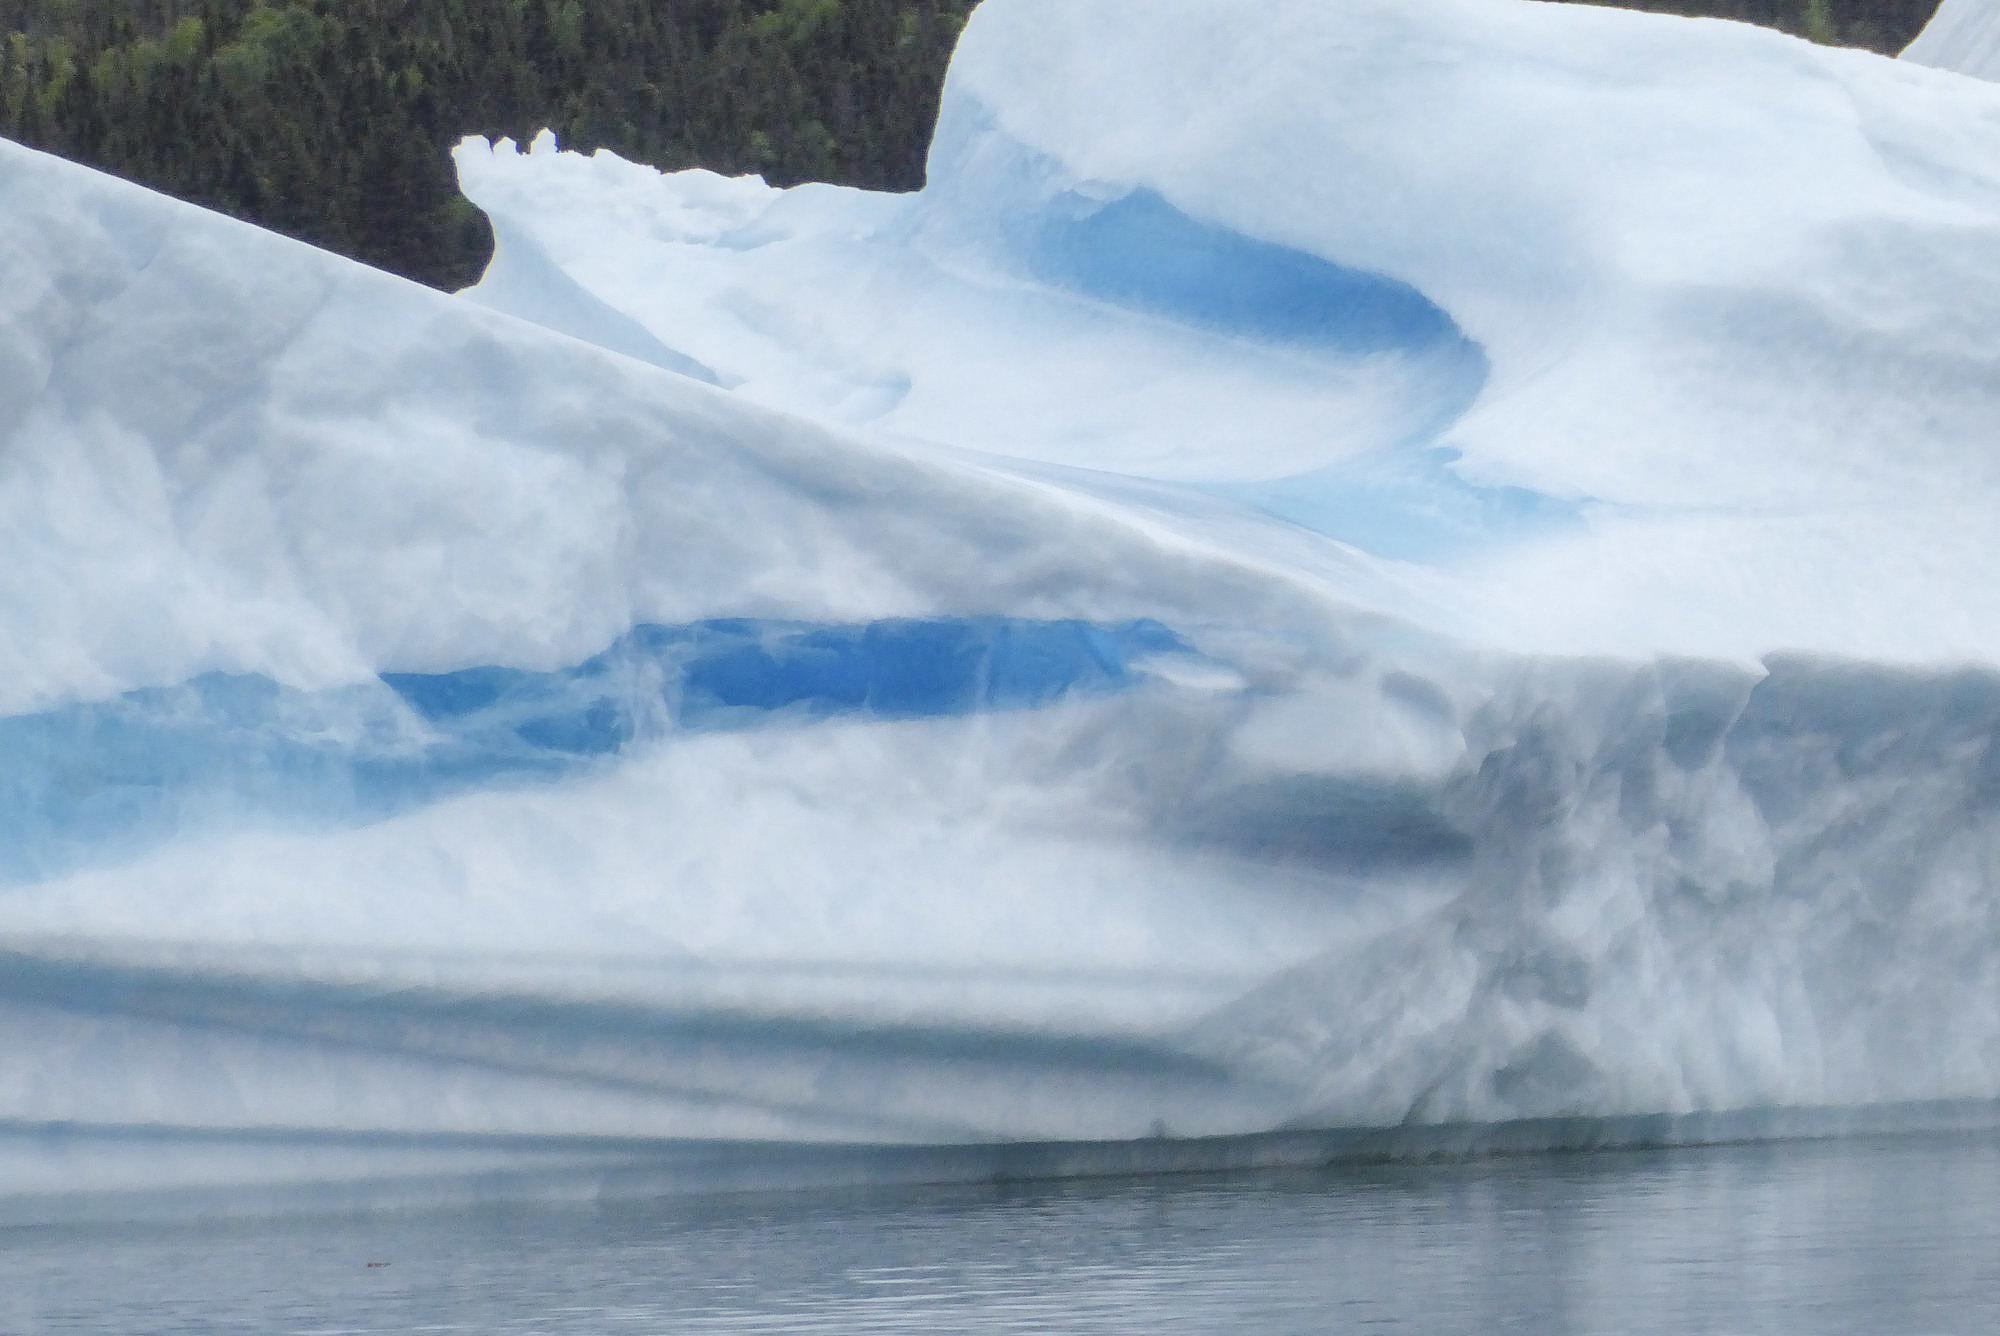 close up of blue ice on iceberg